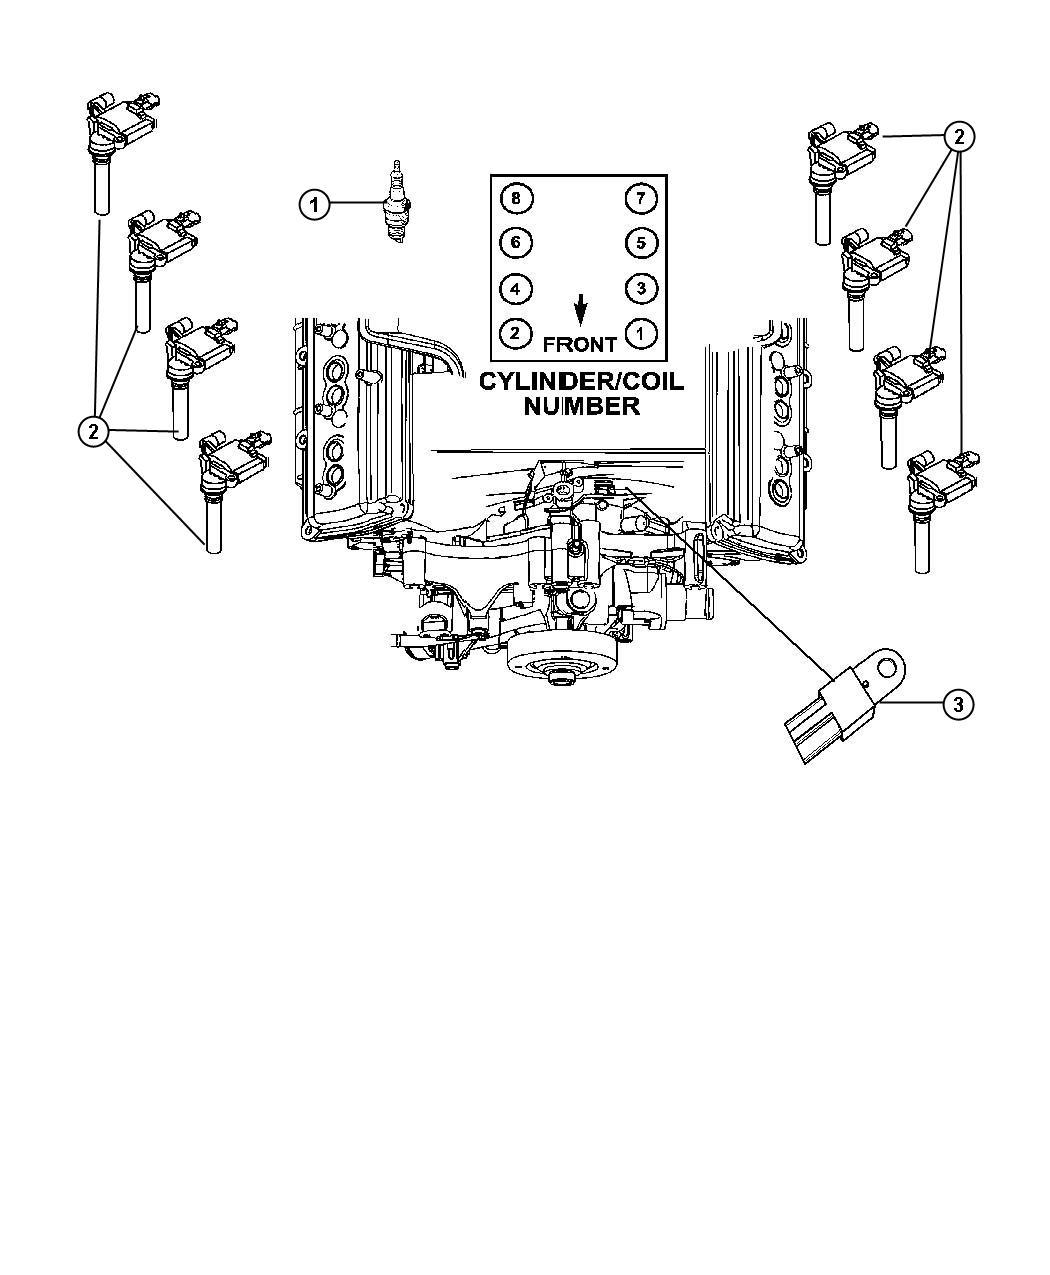 Chrysler 300 Spark Plug Ignition Plugs Engine